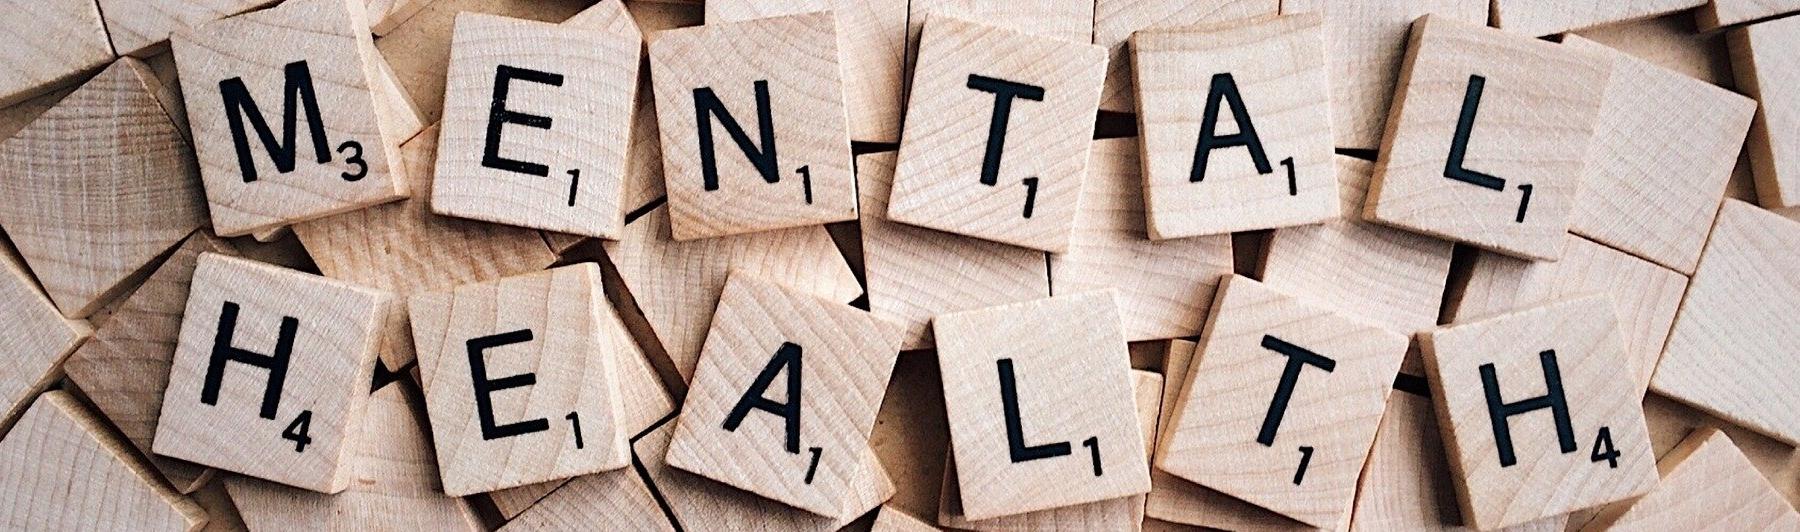 mental_health_act_social_care